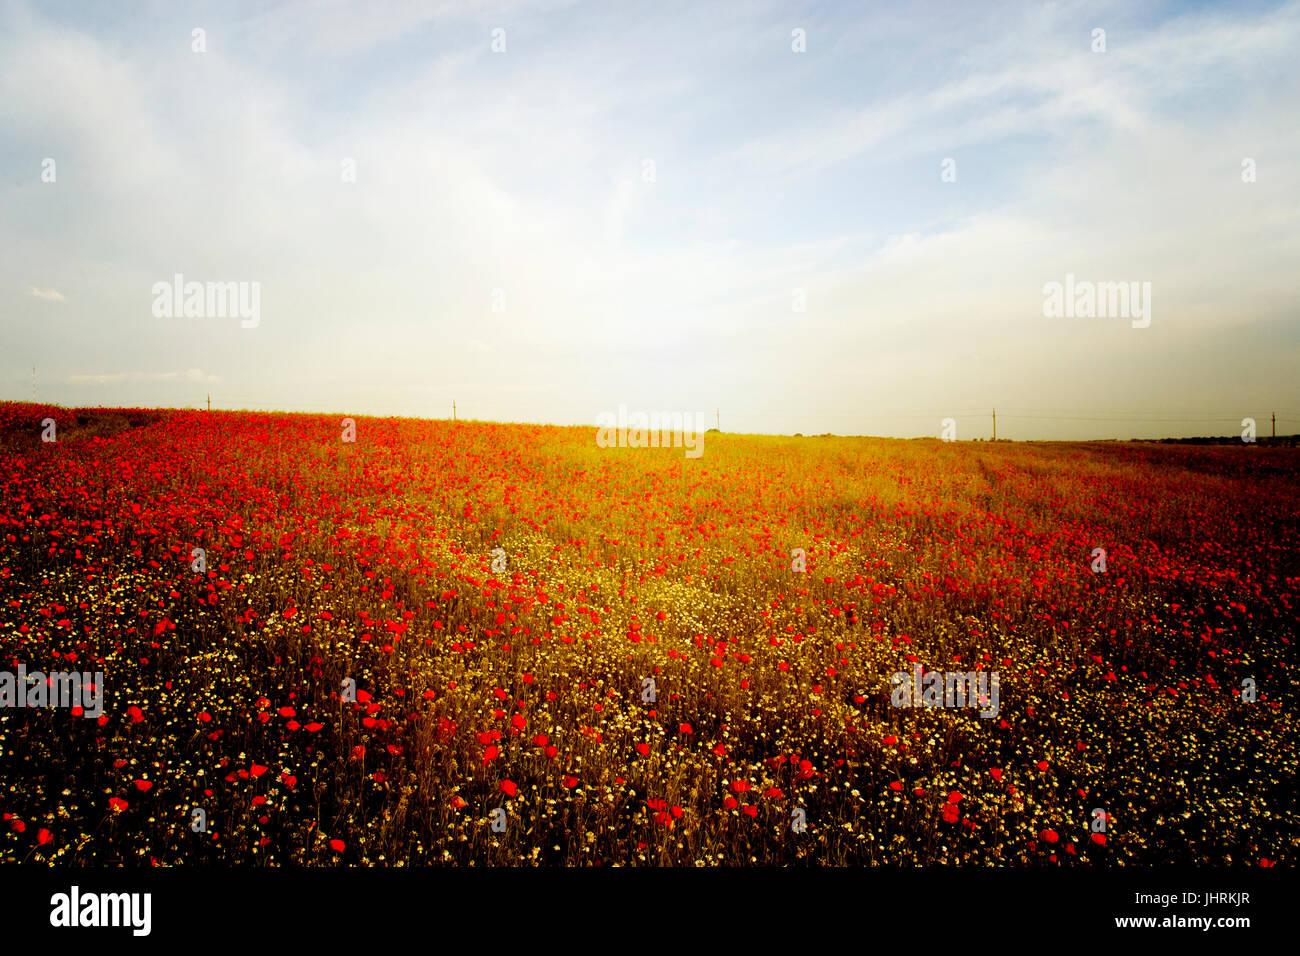 Poppy field in sunset - Stock Image